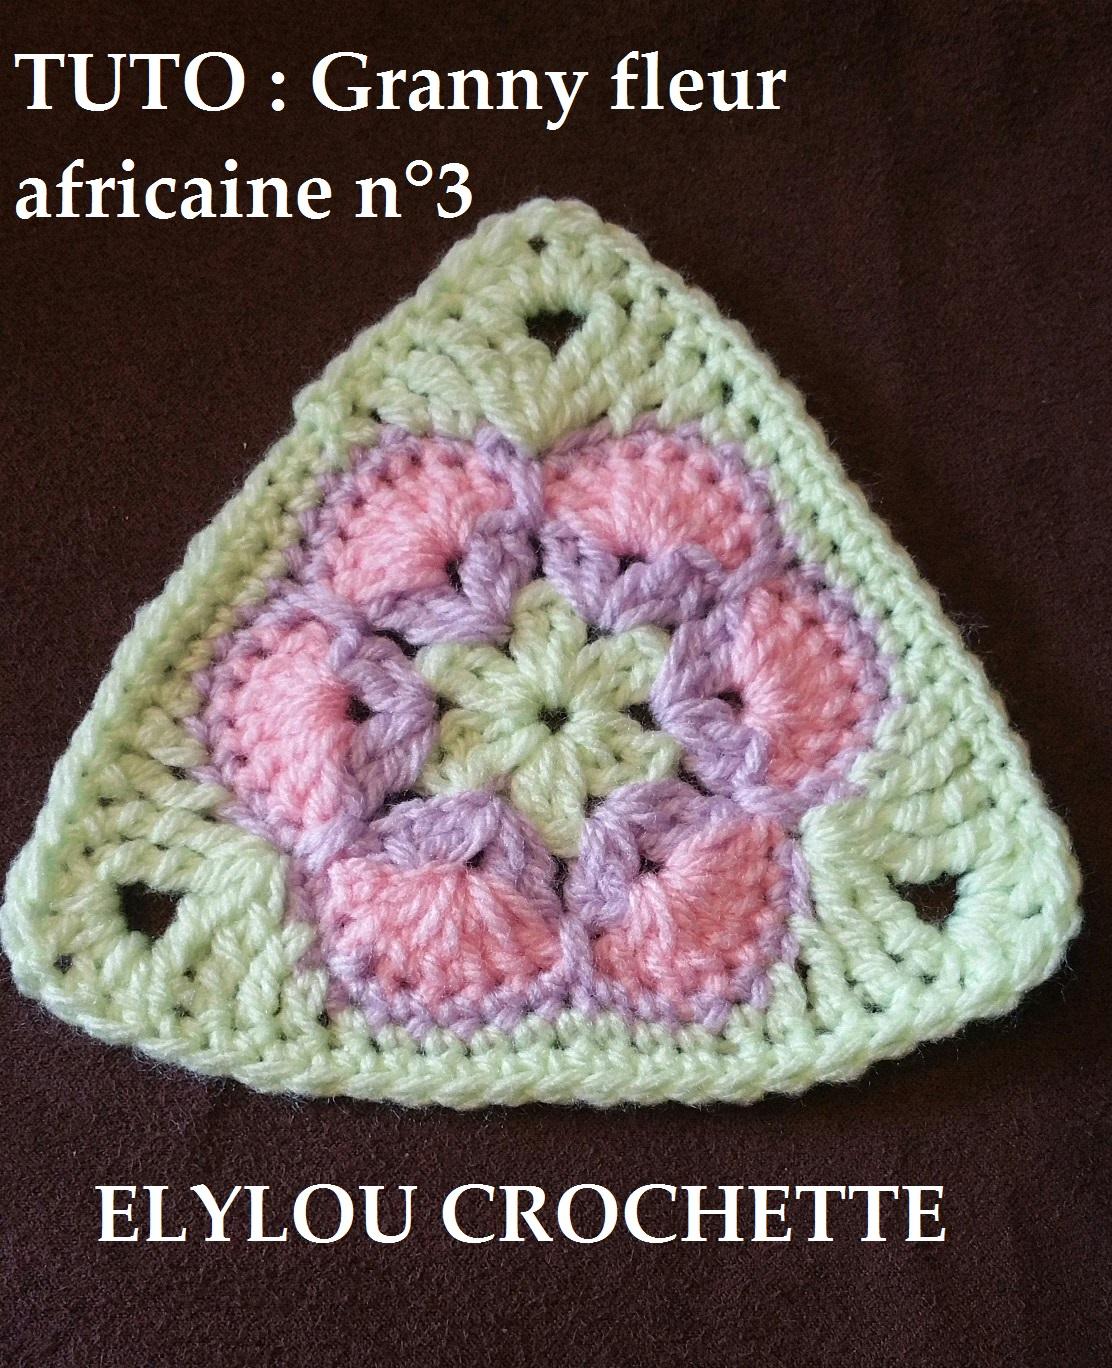 Granny Fleur Africaine N 3 Elylou Crochette